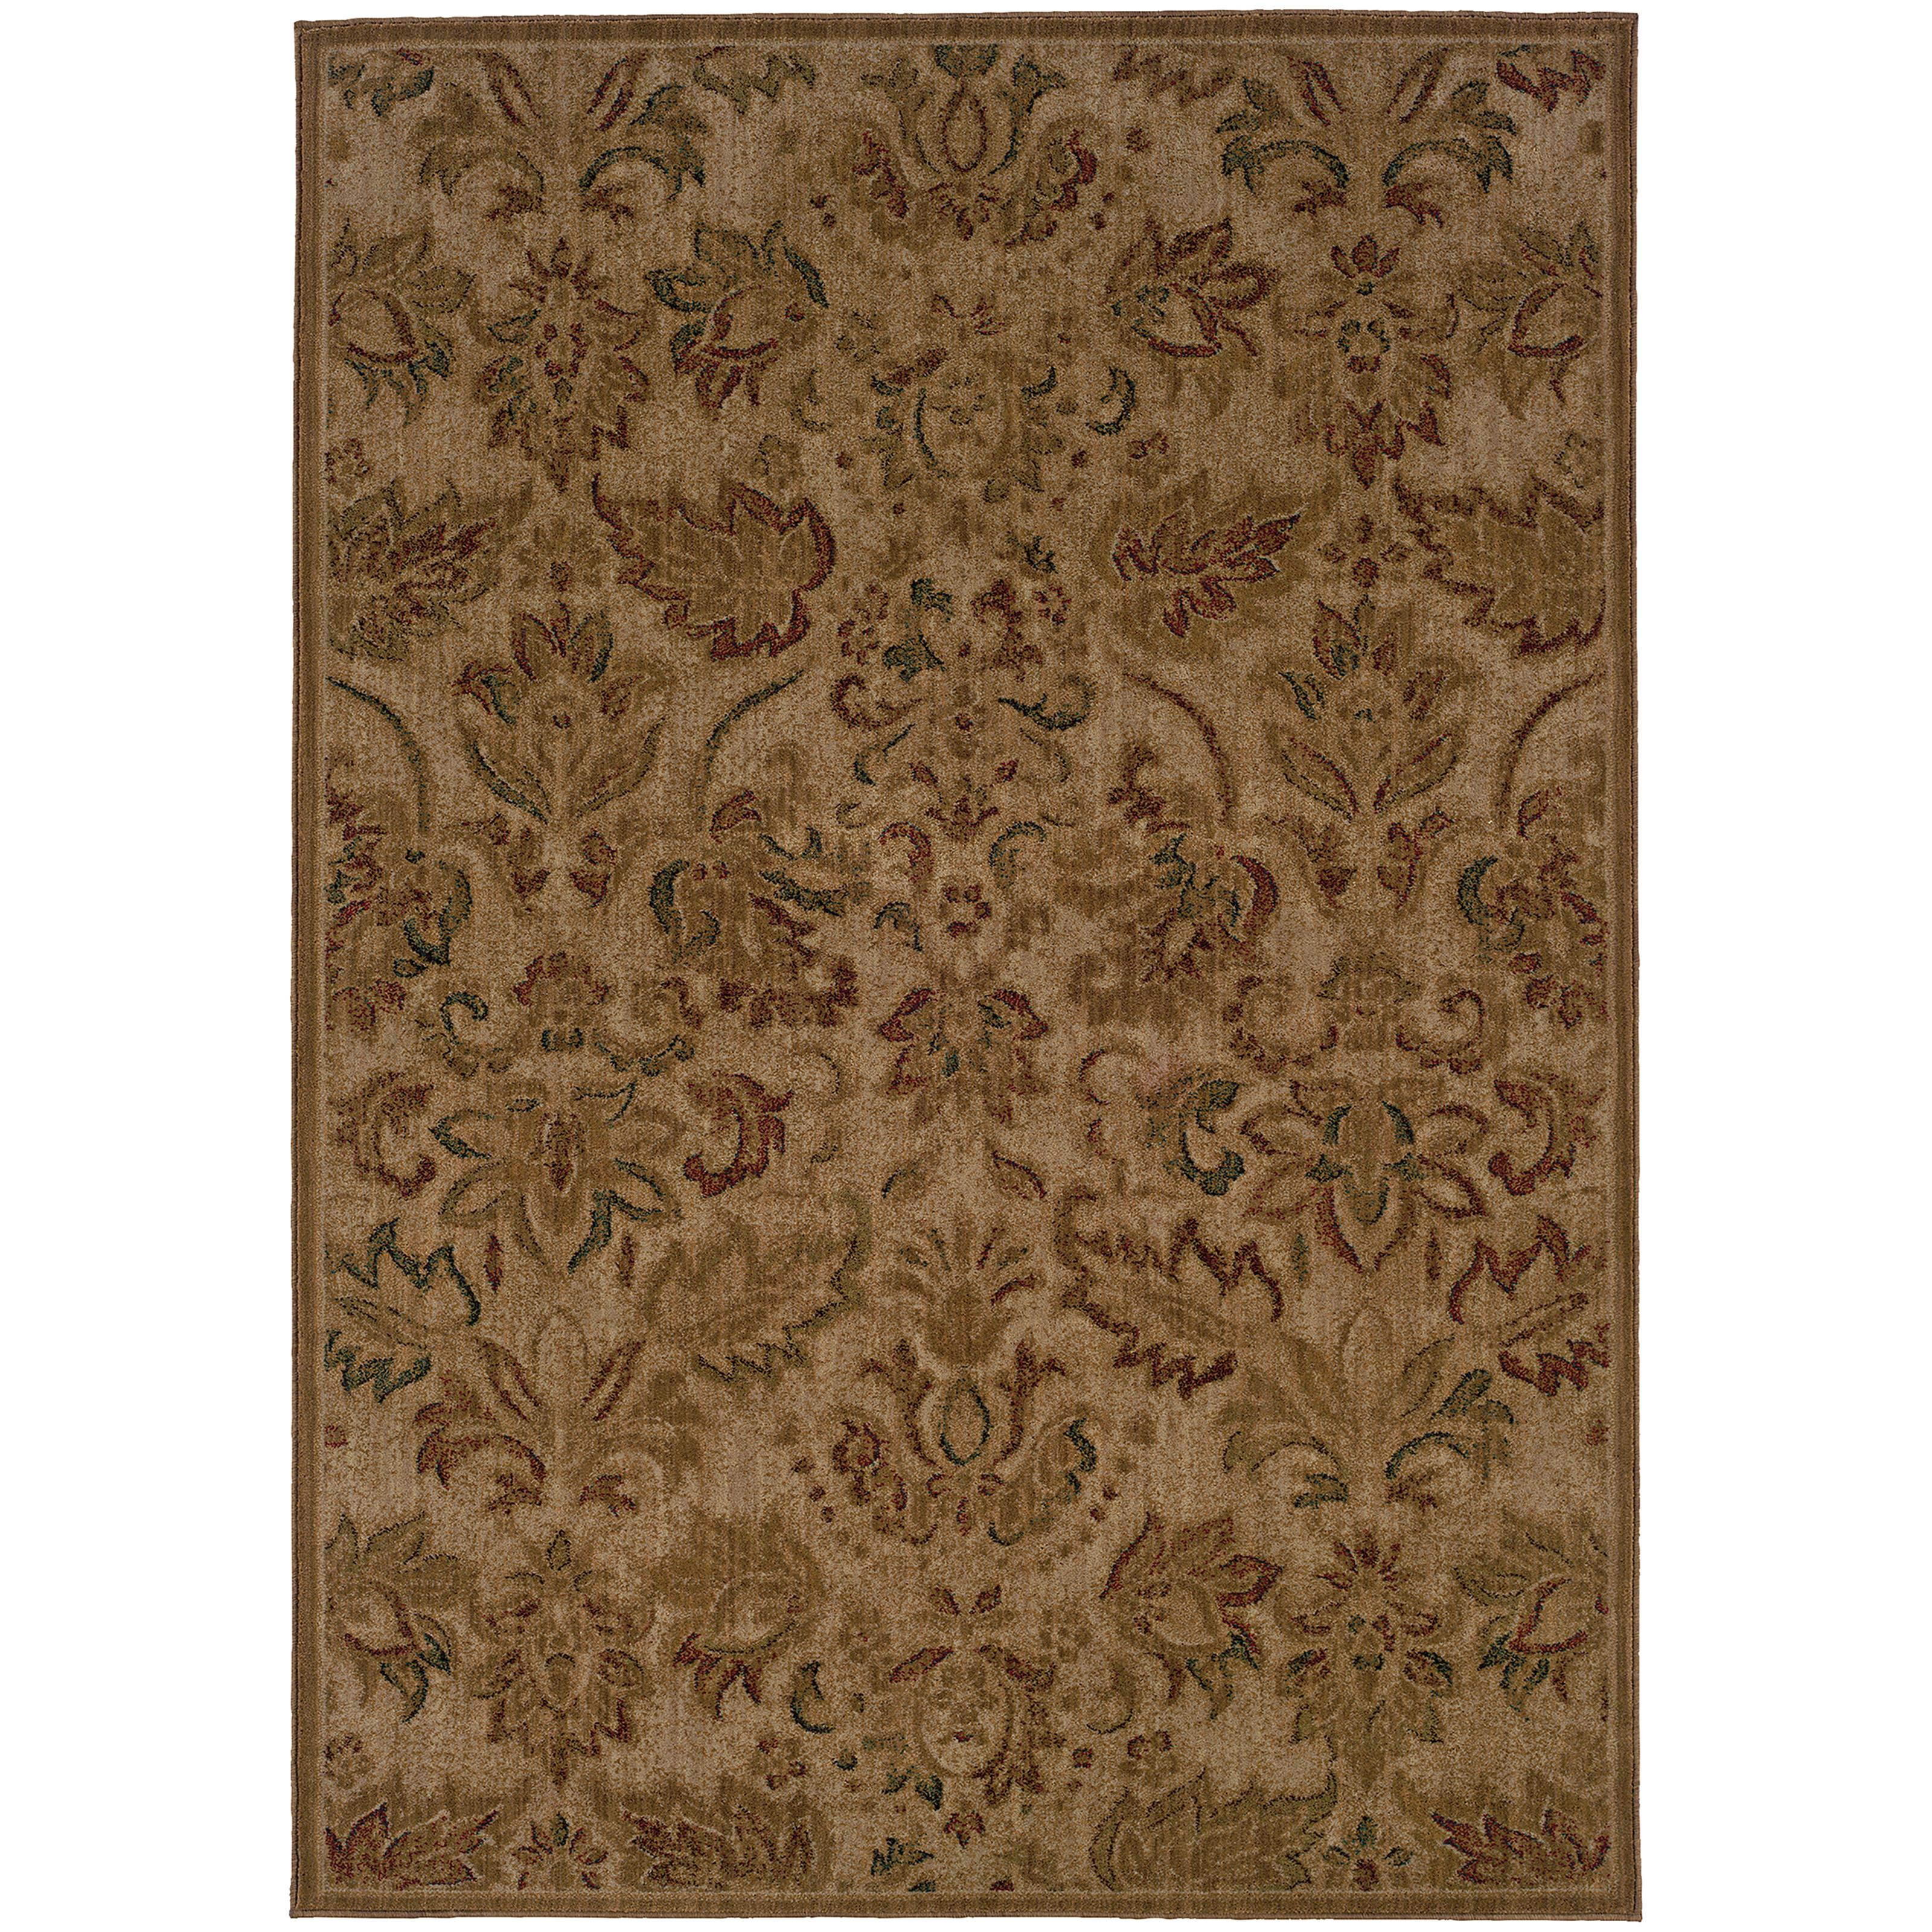 "Oriental Weavers Allure 9'10"" X 12' 9"" Rug - Item Number: A057B1300390ST"